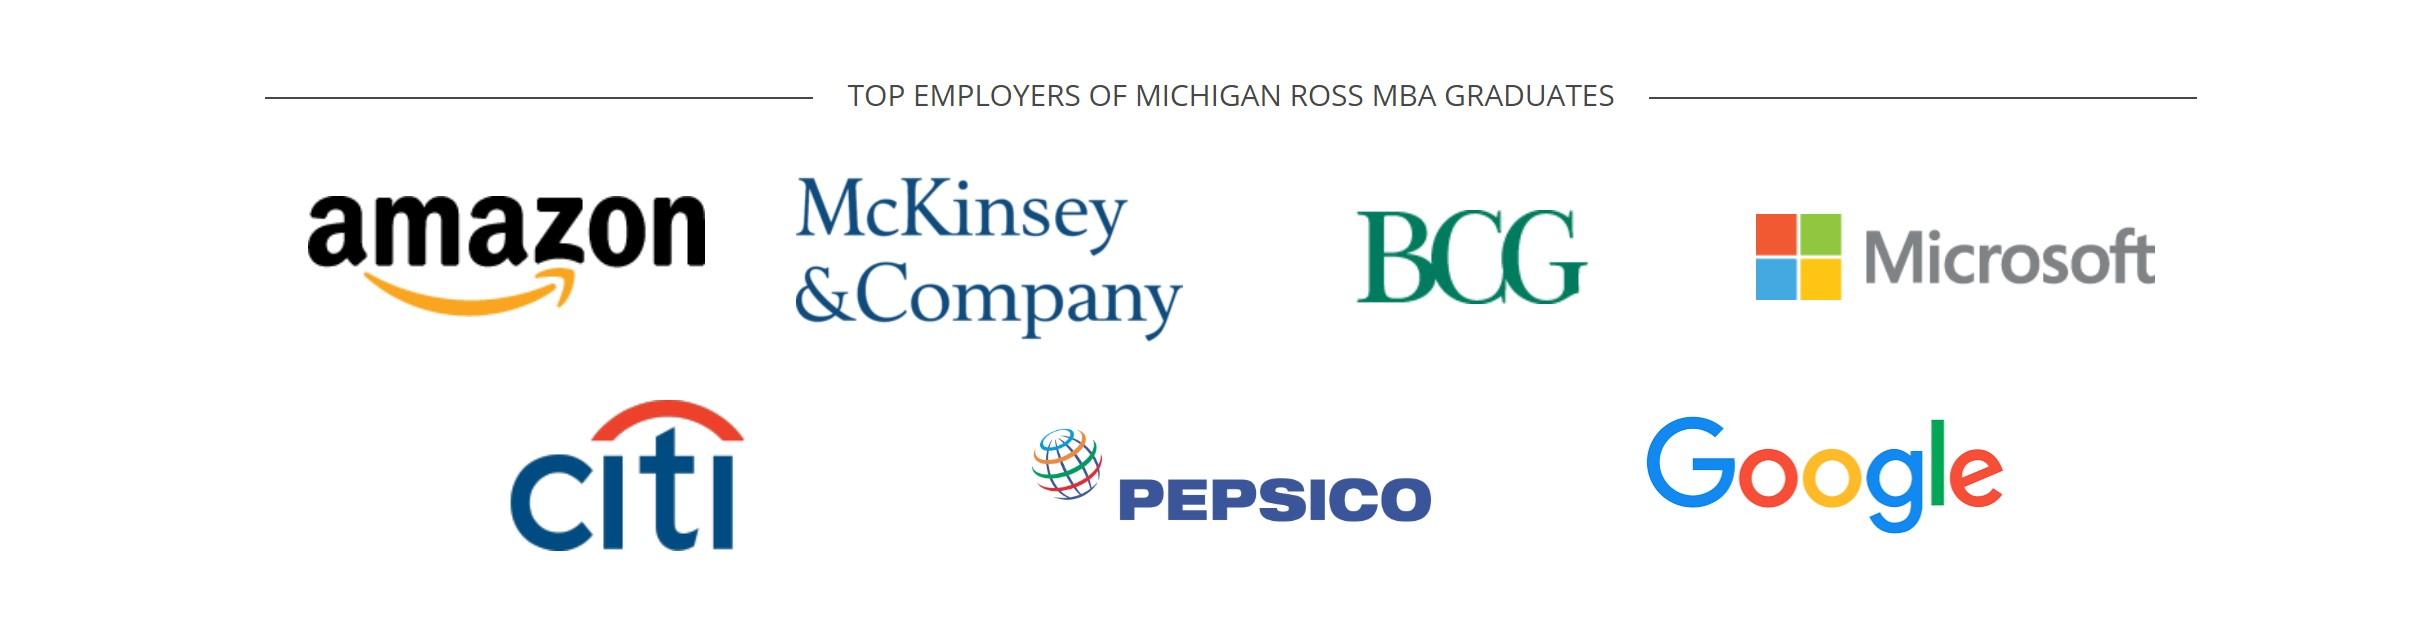 Michigan Ross School of Business - Top Employers